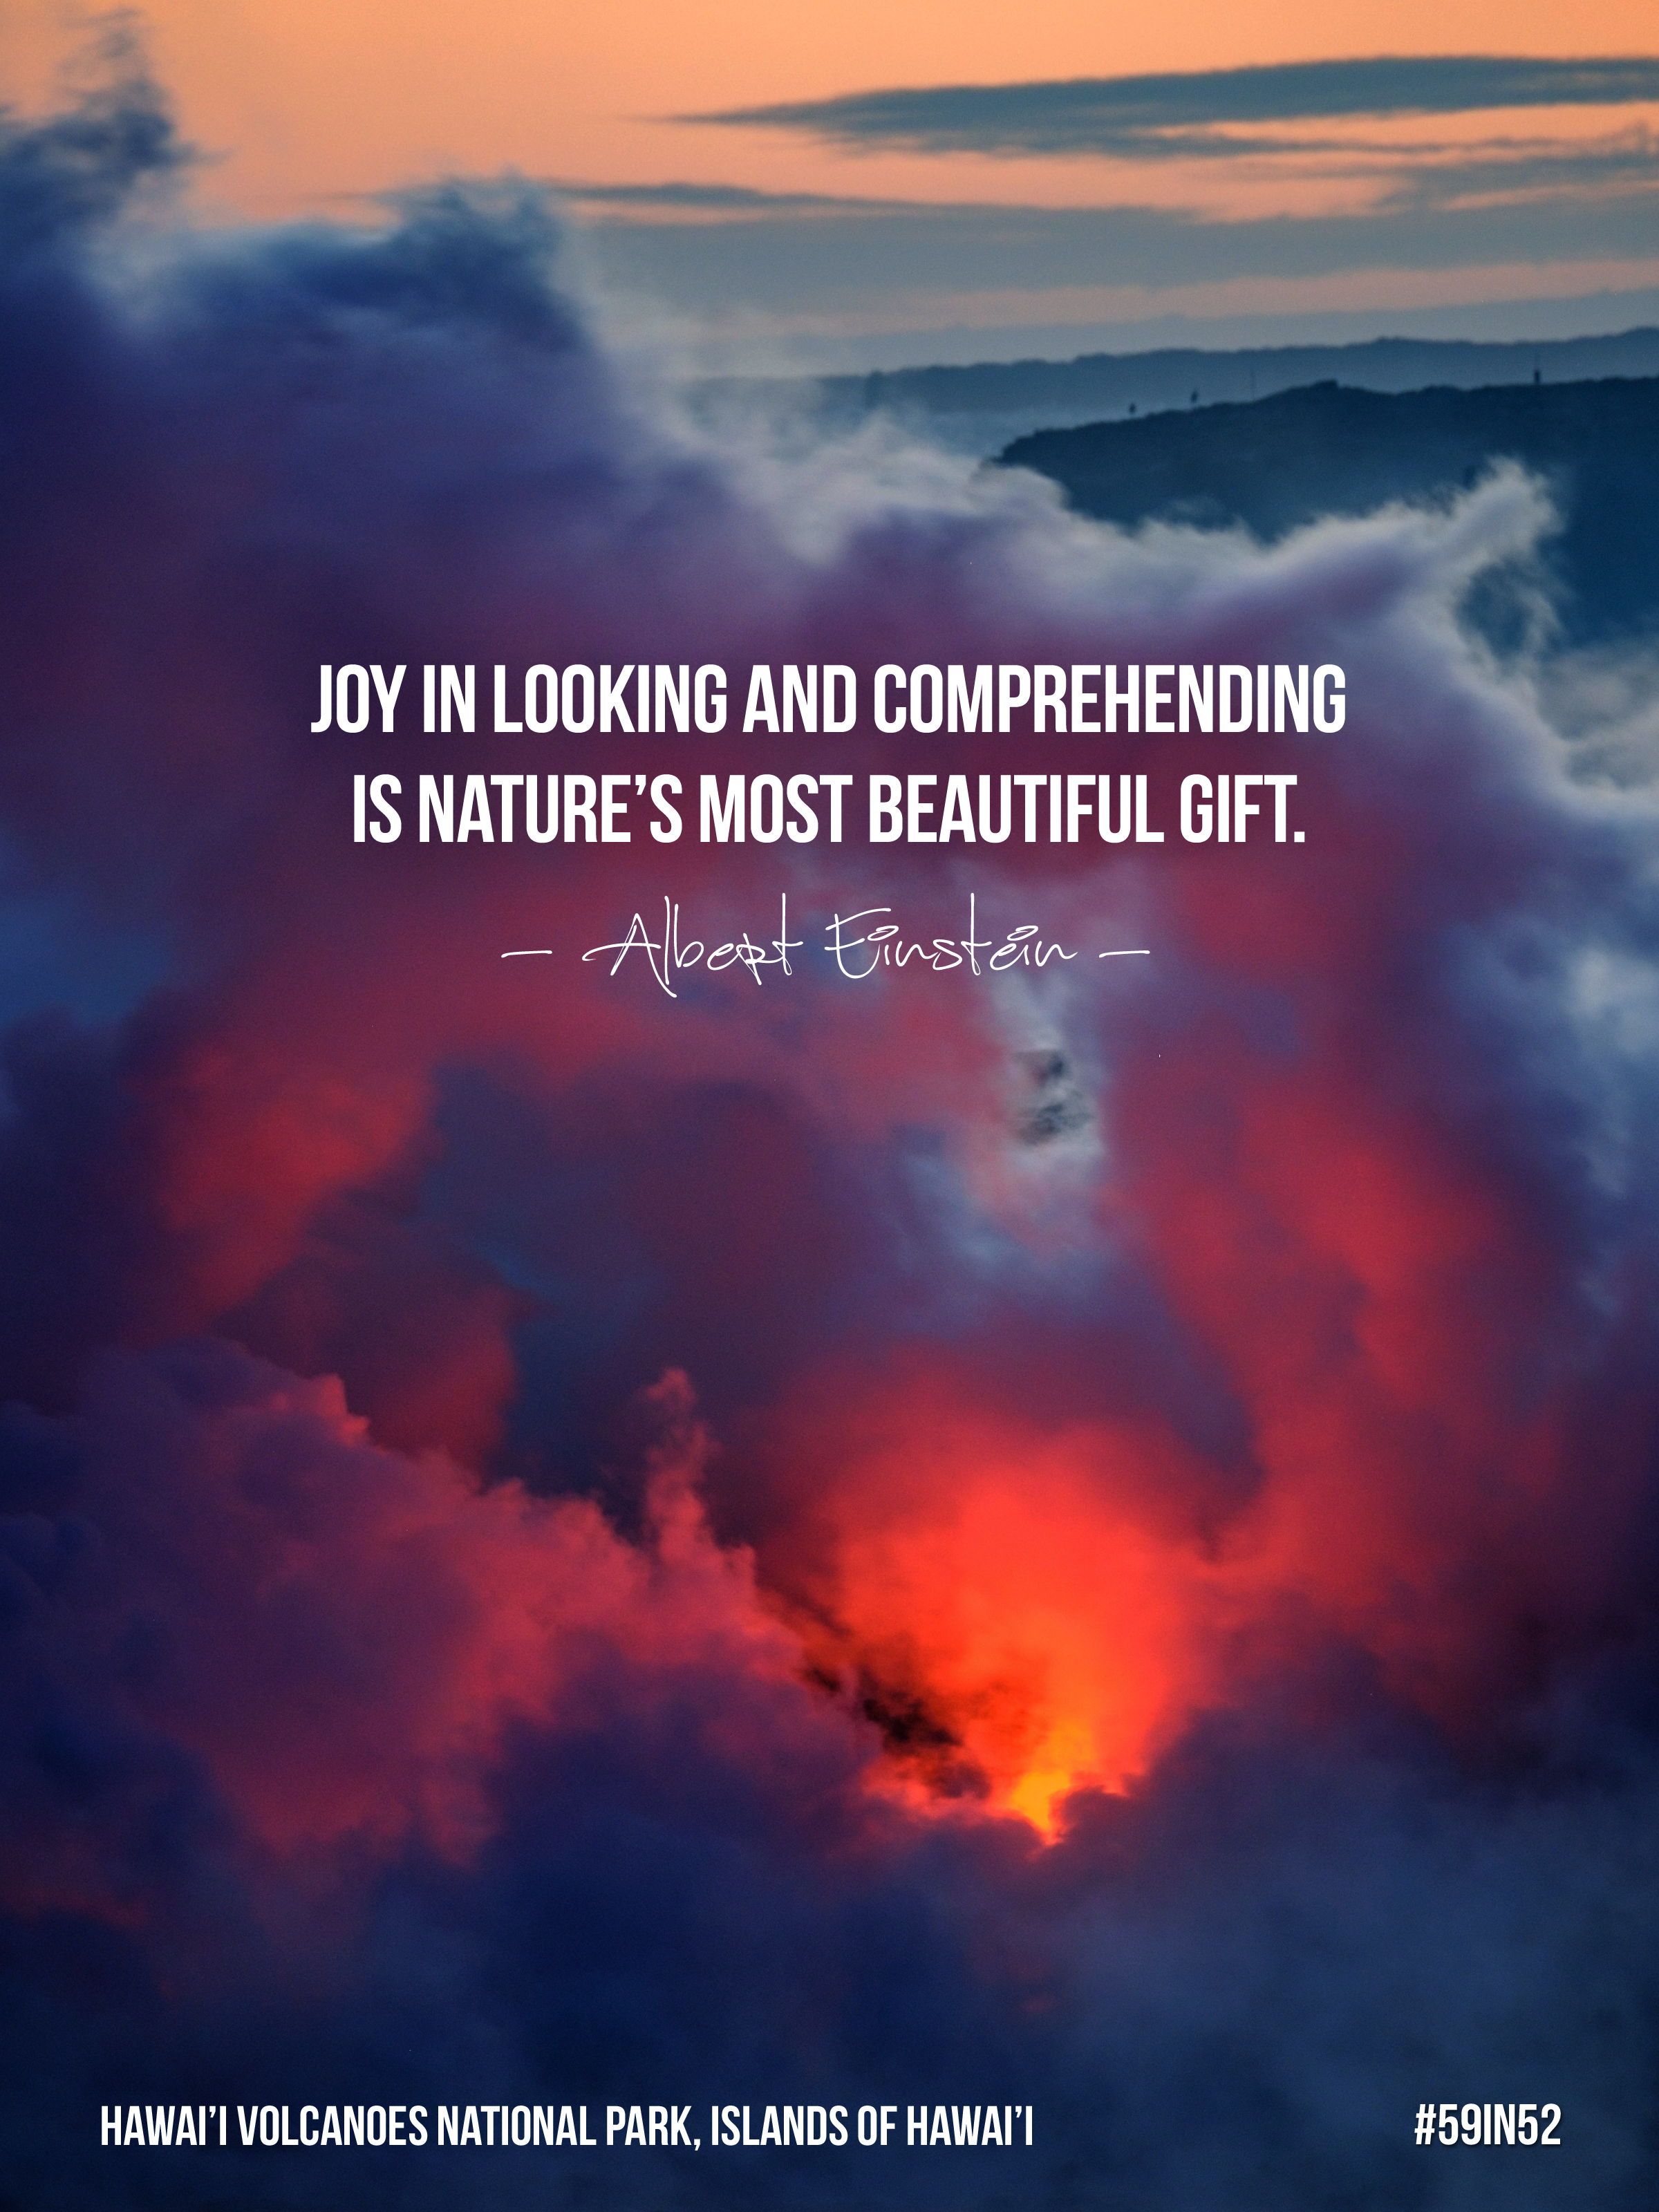 'Joy in looking and comprehending is nature's most beautiful gift.' -Albert Einstein